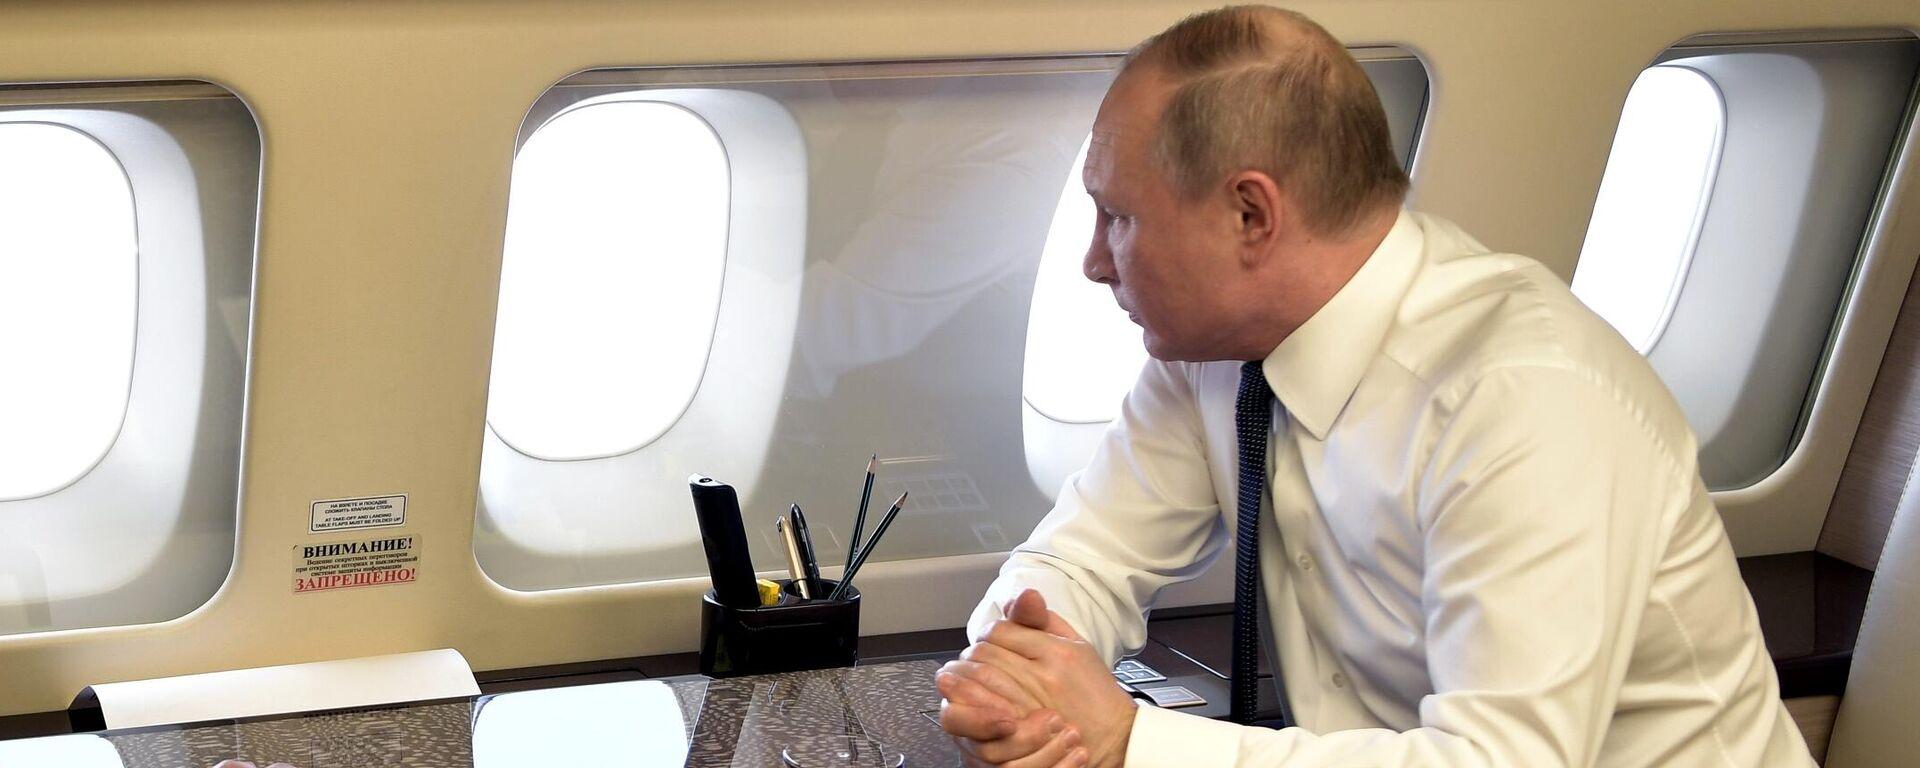 Putin osserva dal suo aereo presidenziale  - Sputnik Italia, 1920, 30.06.2021